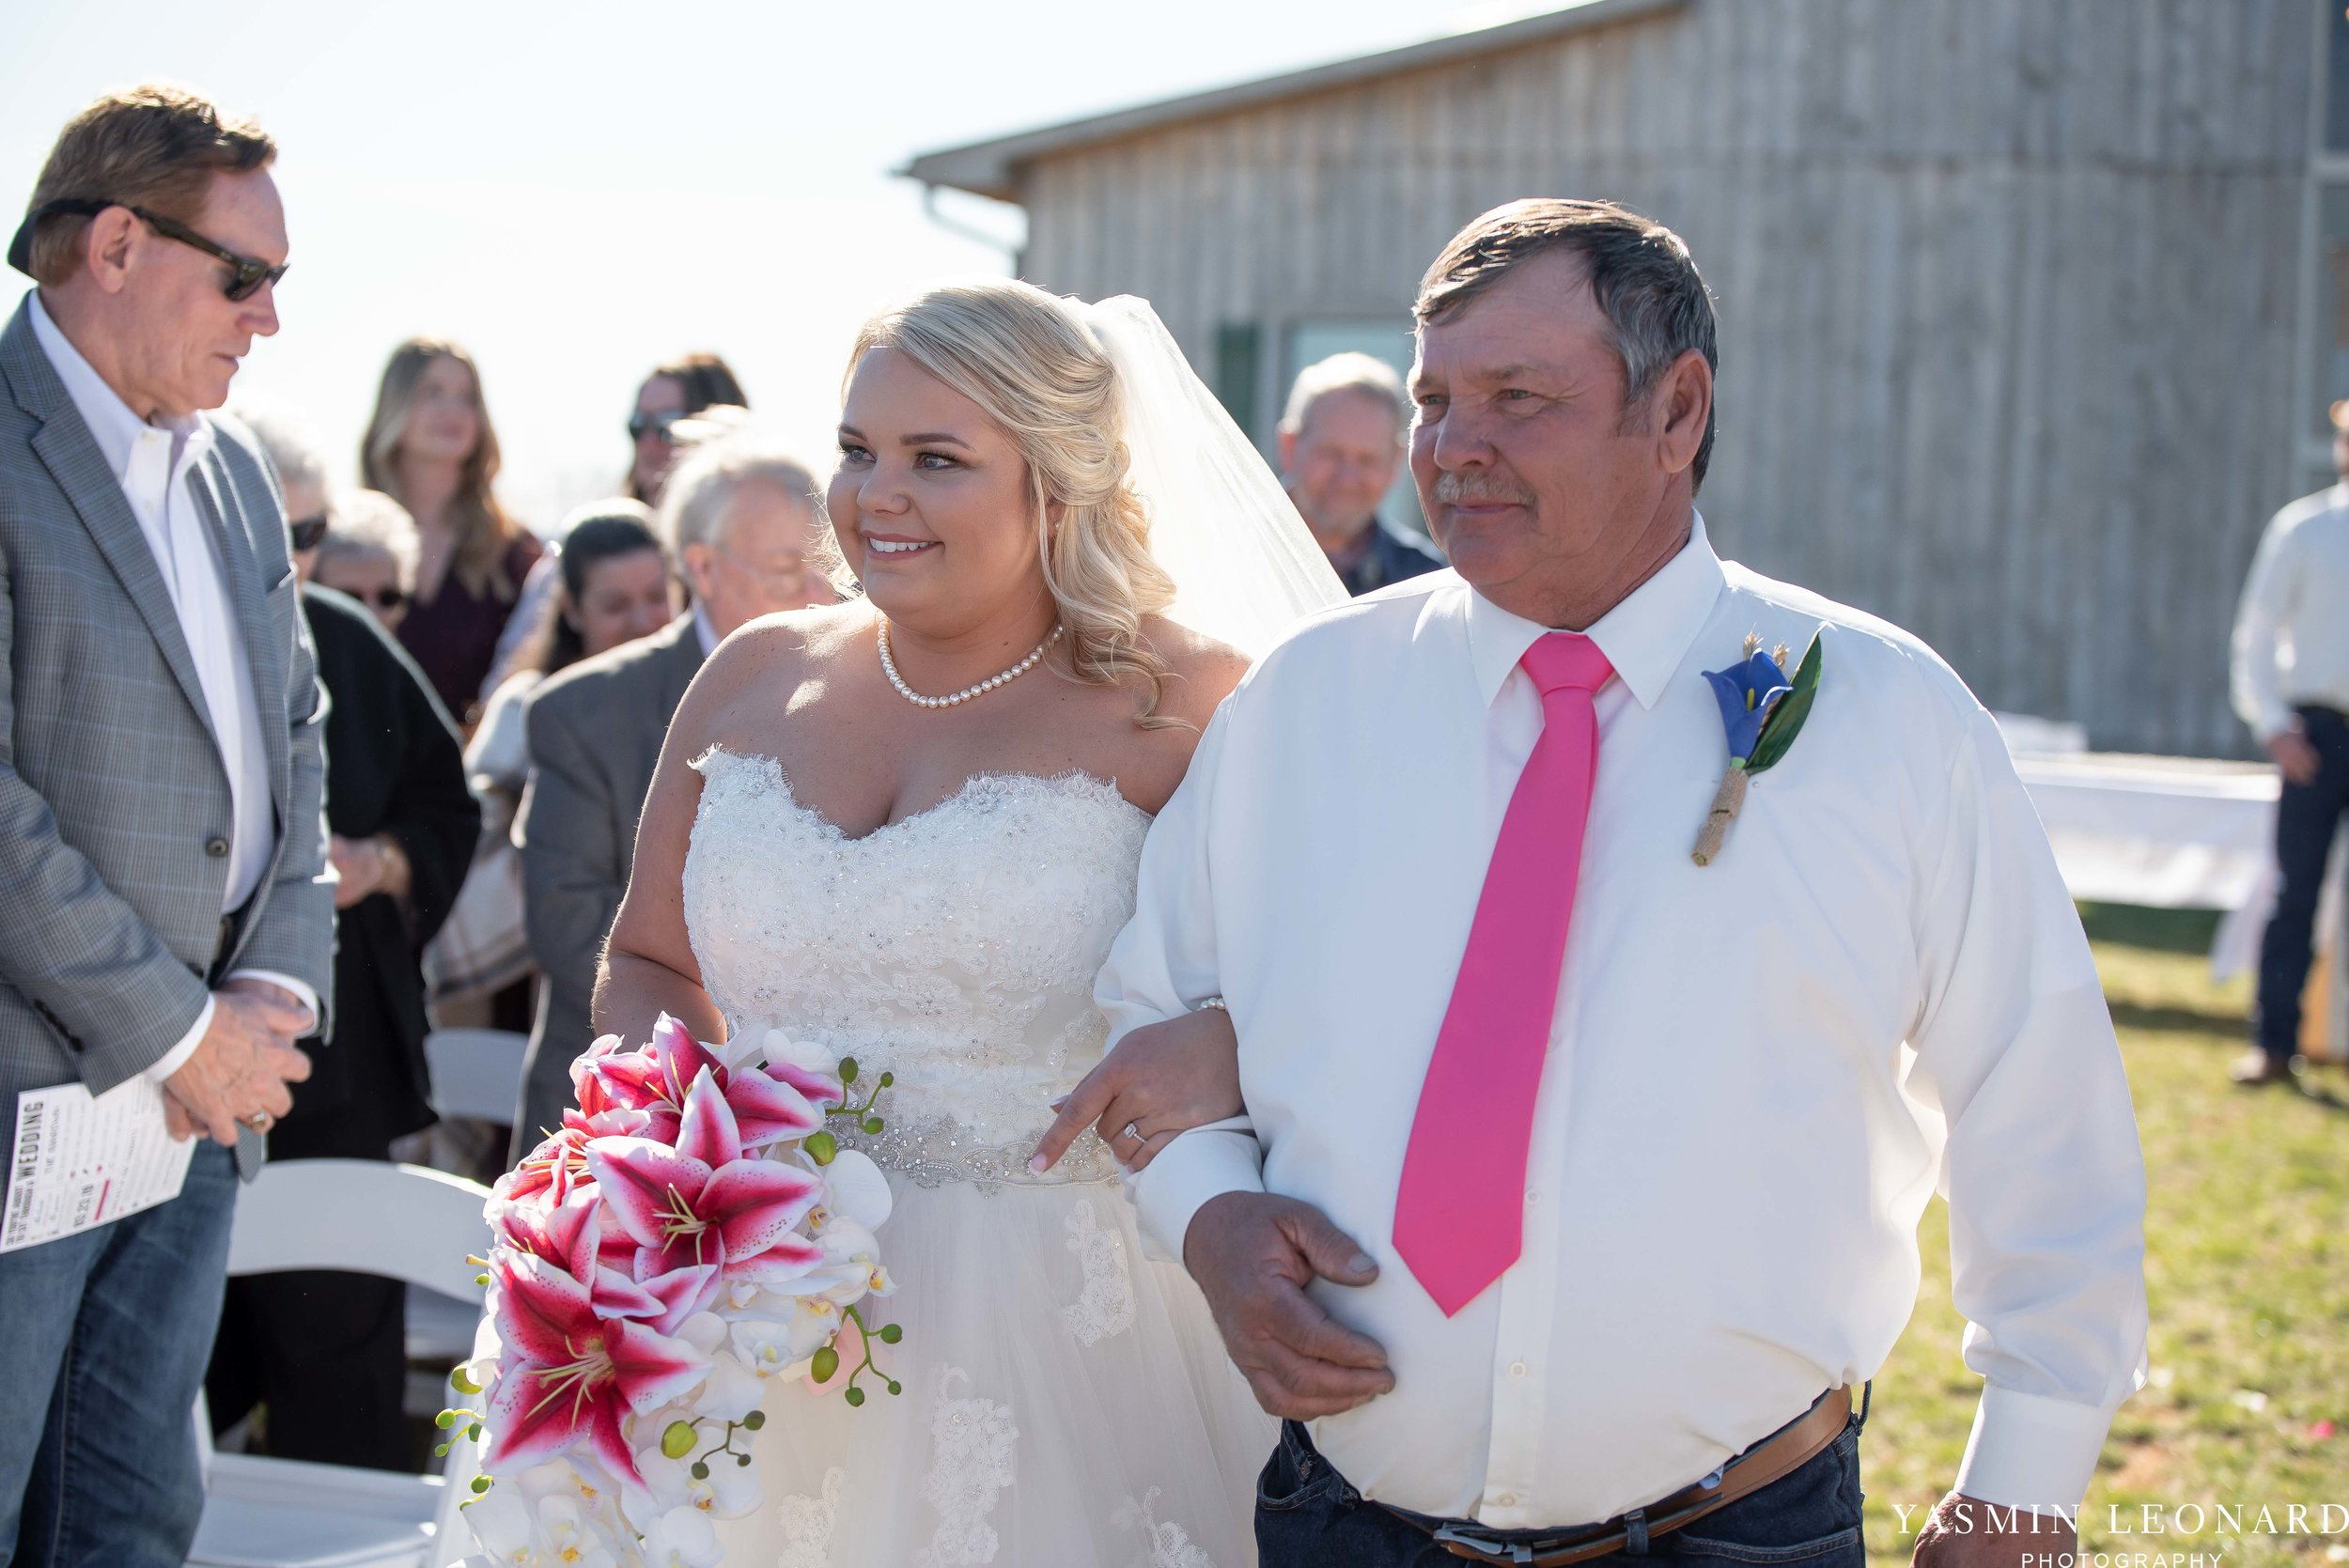 The Barn at Heritage Farm - Country Wedding - Pink and Blue Wedding - Barn Wedding - Outdoor Wedding - Cotton and Wheat Decor - Groom in Bibs - Pink Bridal Colors - Yasmin Leonard Photography-11.jpg